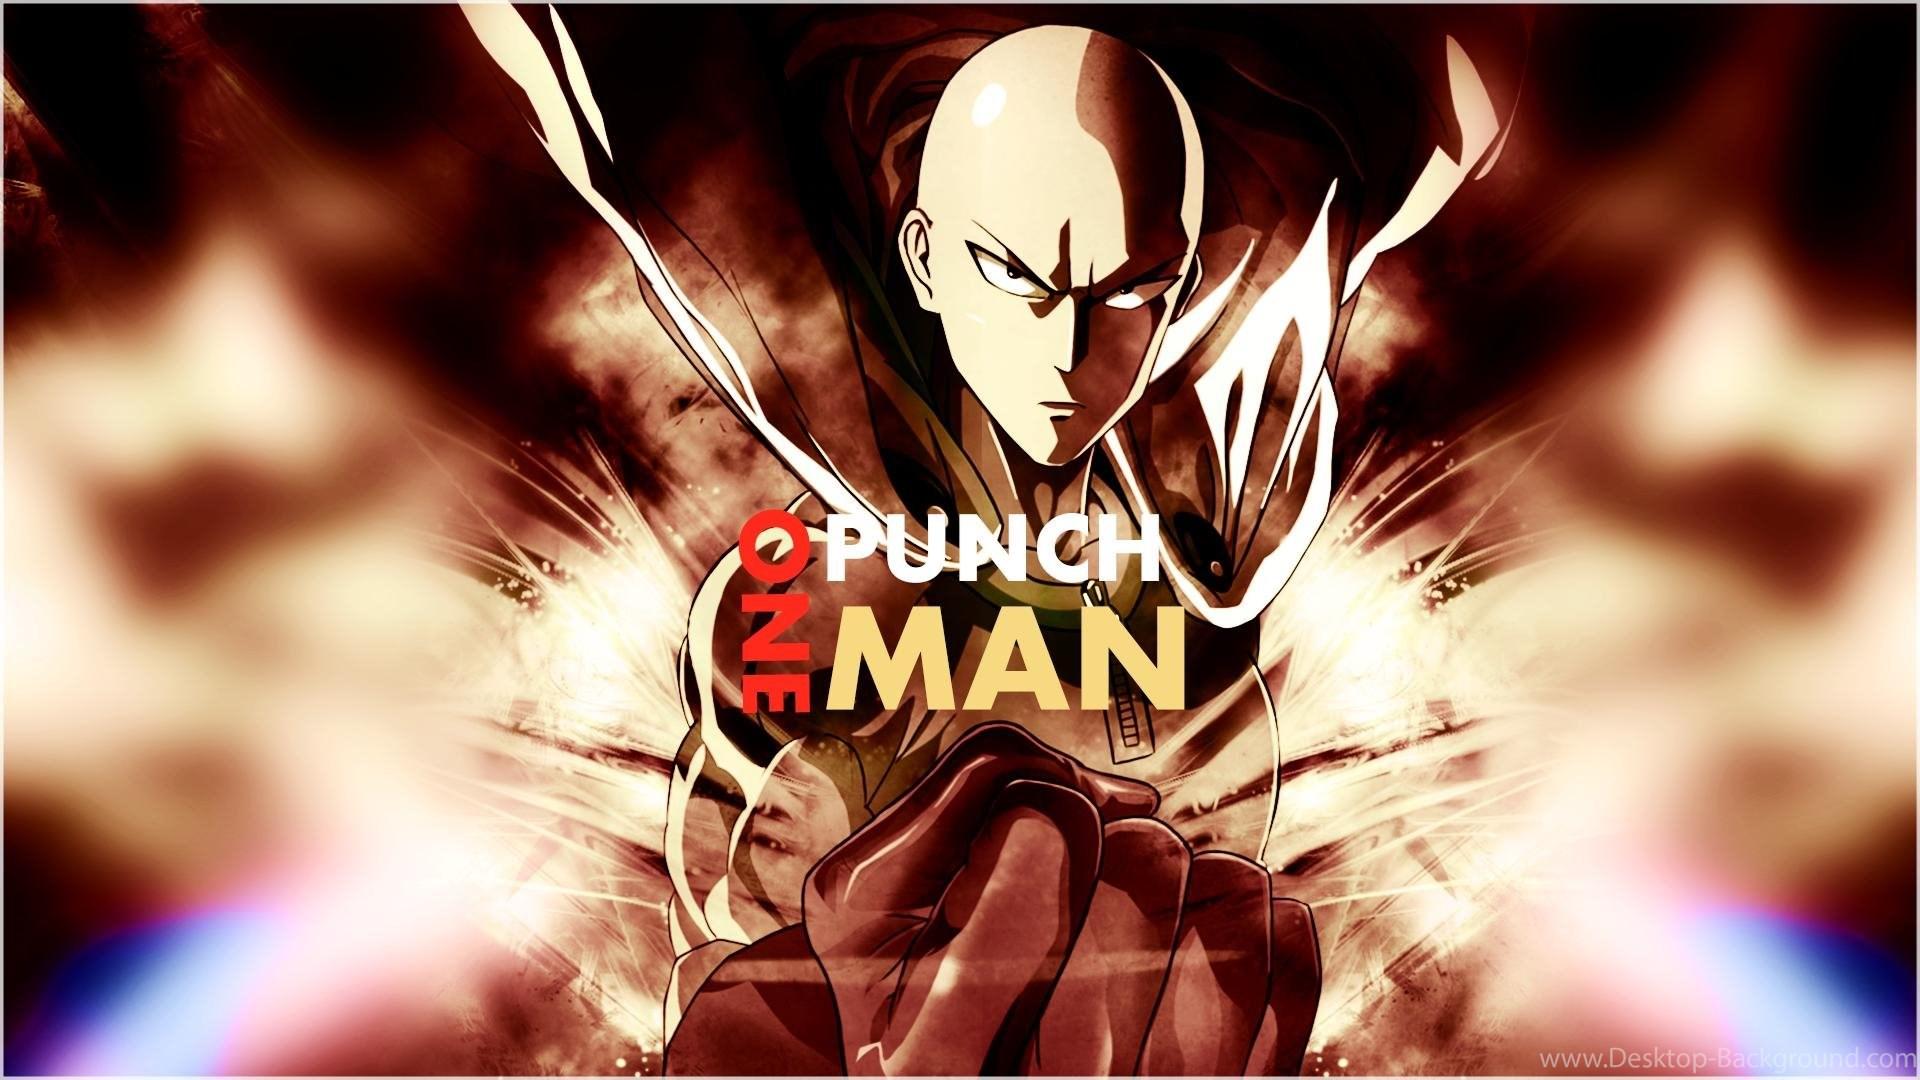 Popular One Punch Man Anime Wallpaper Hd 20117 Hd